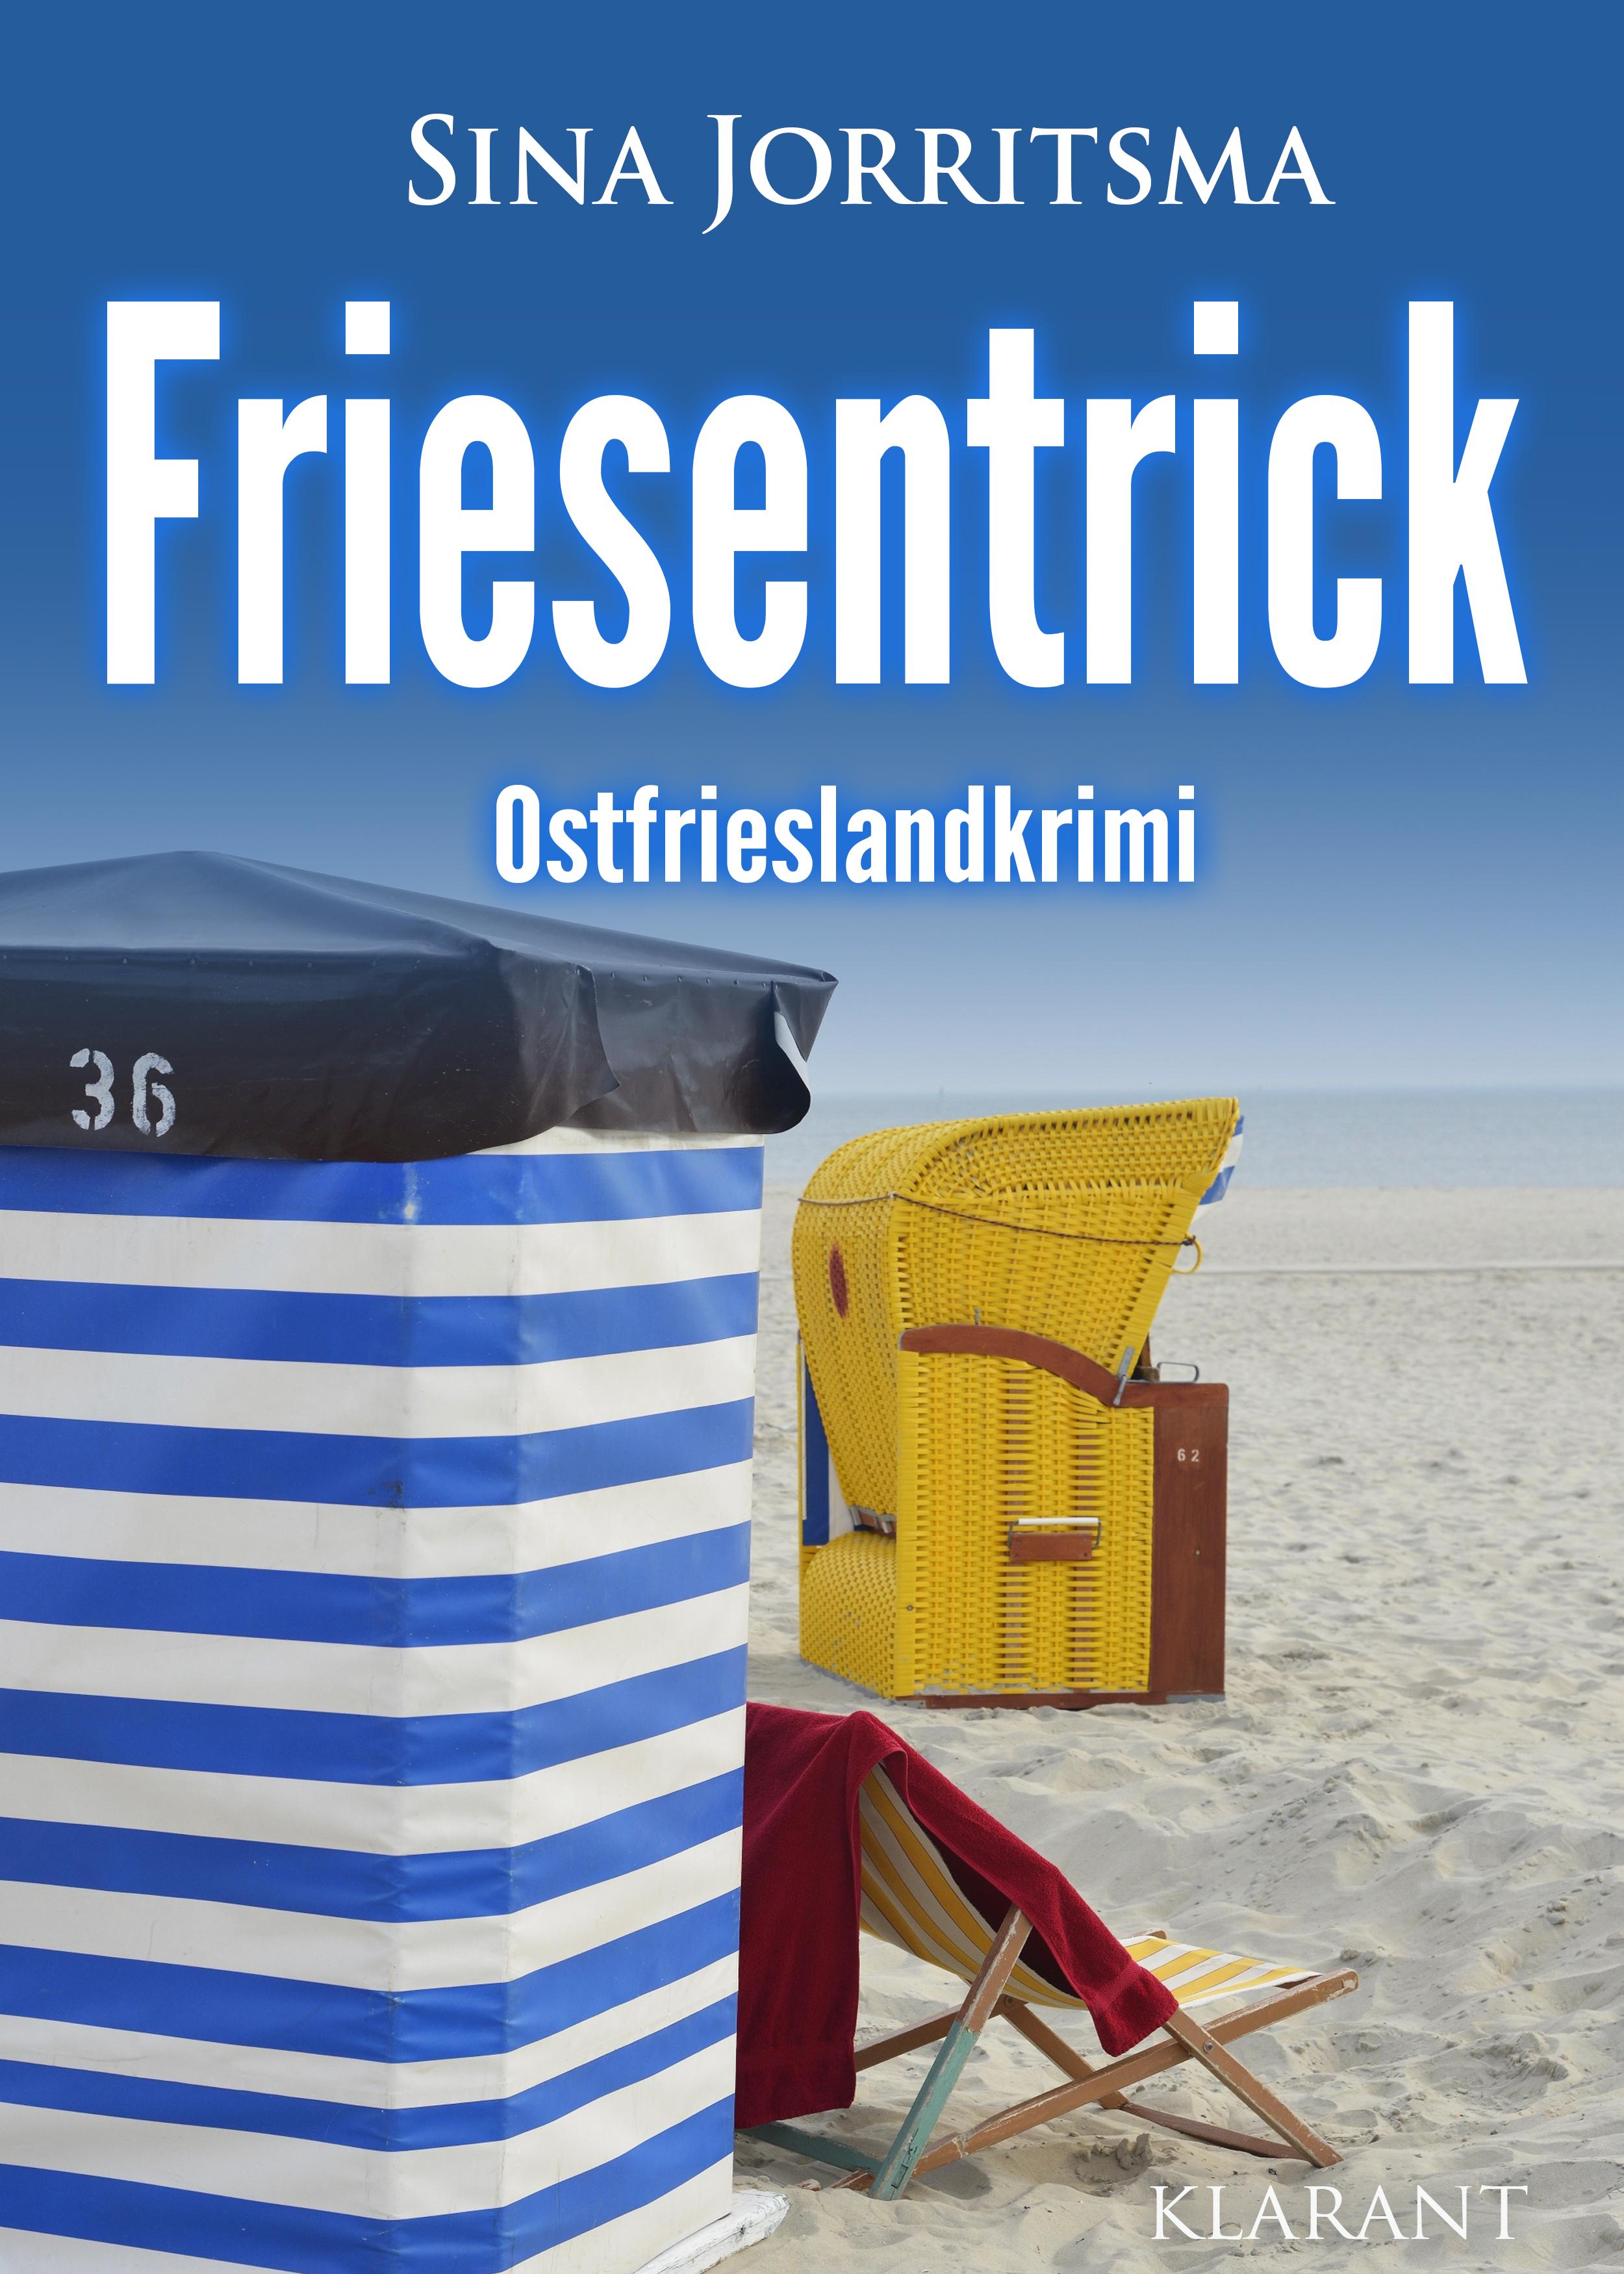 9011625778261970_FrisentrickCoverfinal.jpg